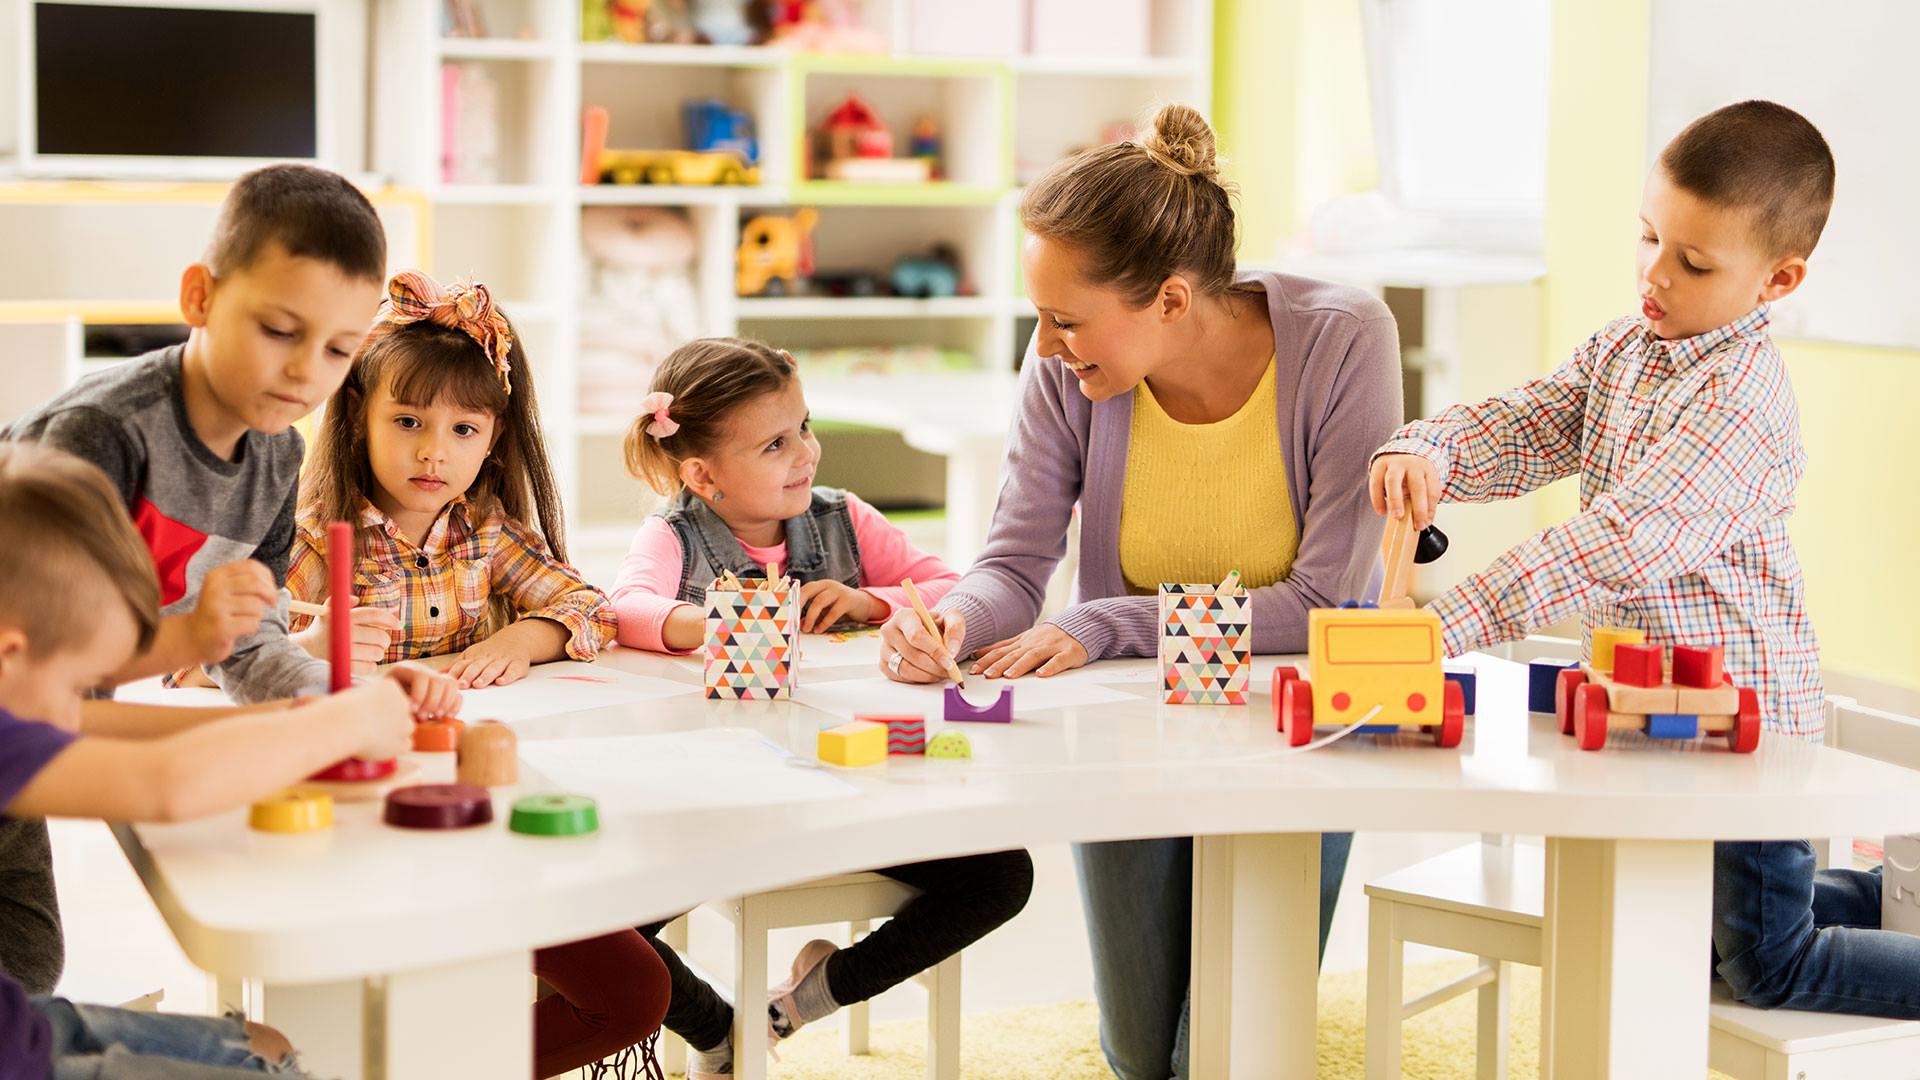 Teacher working with children in classroom